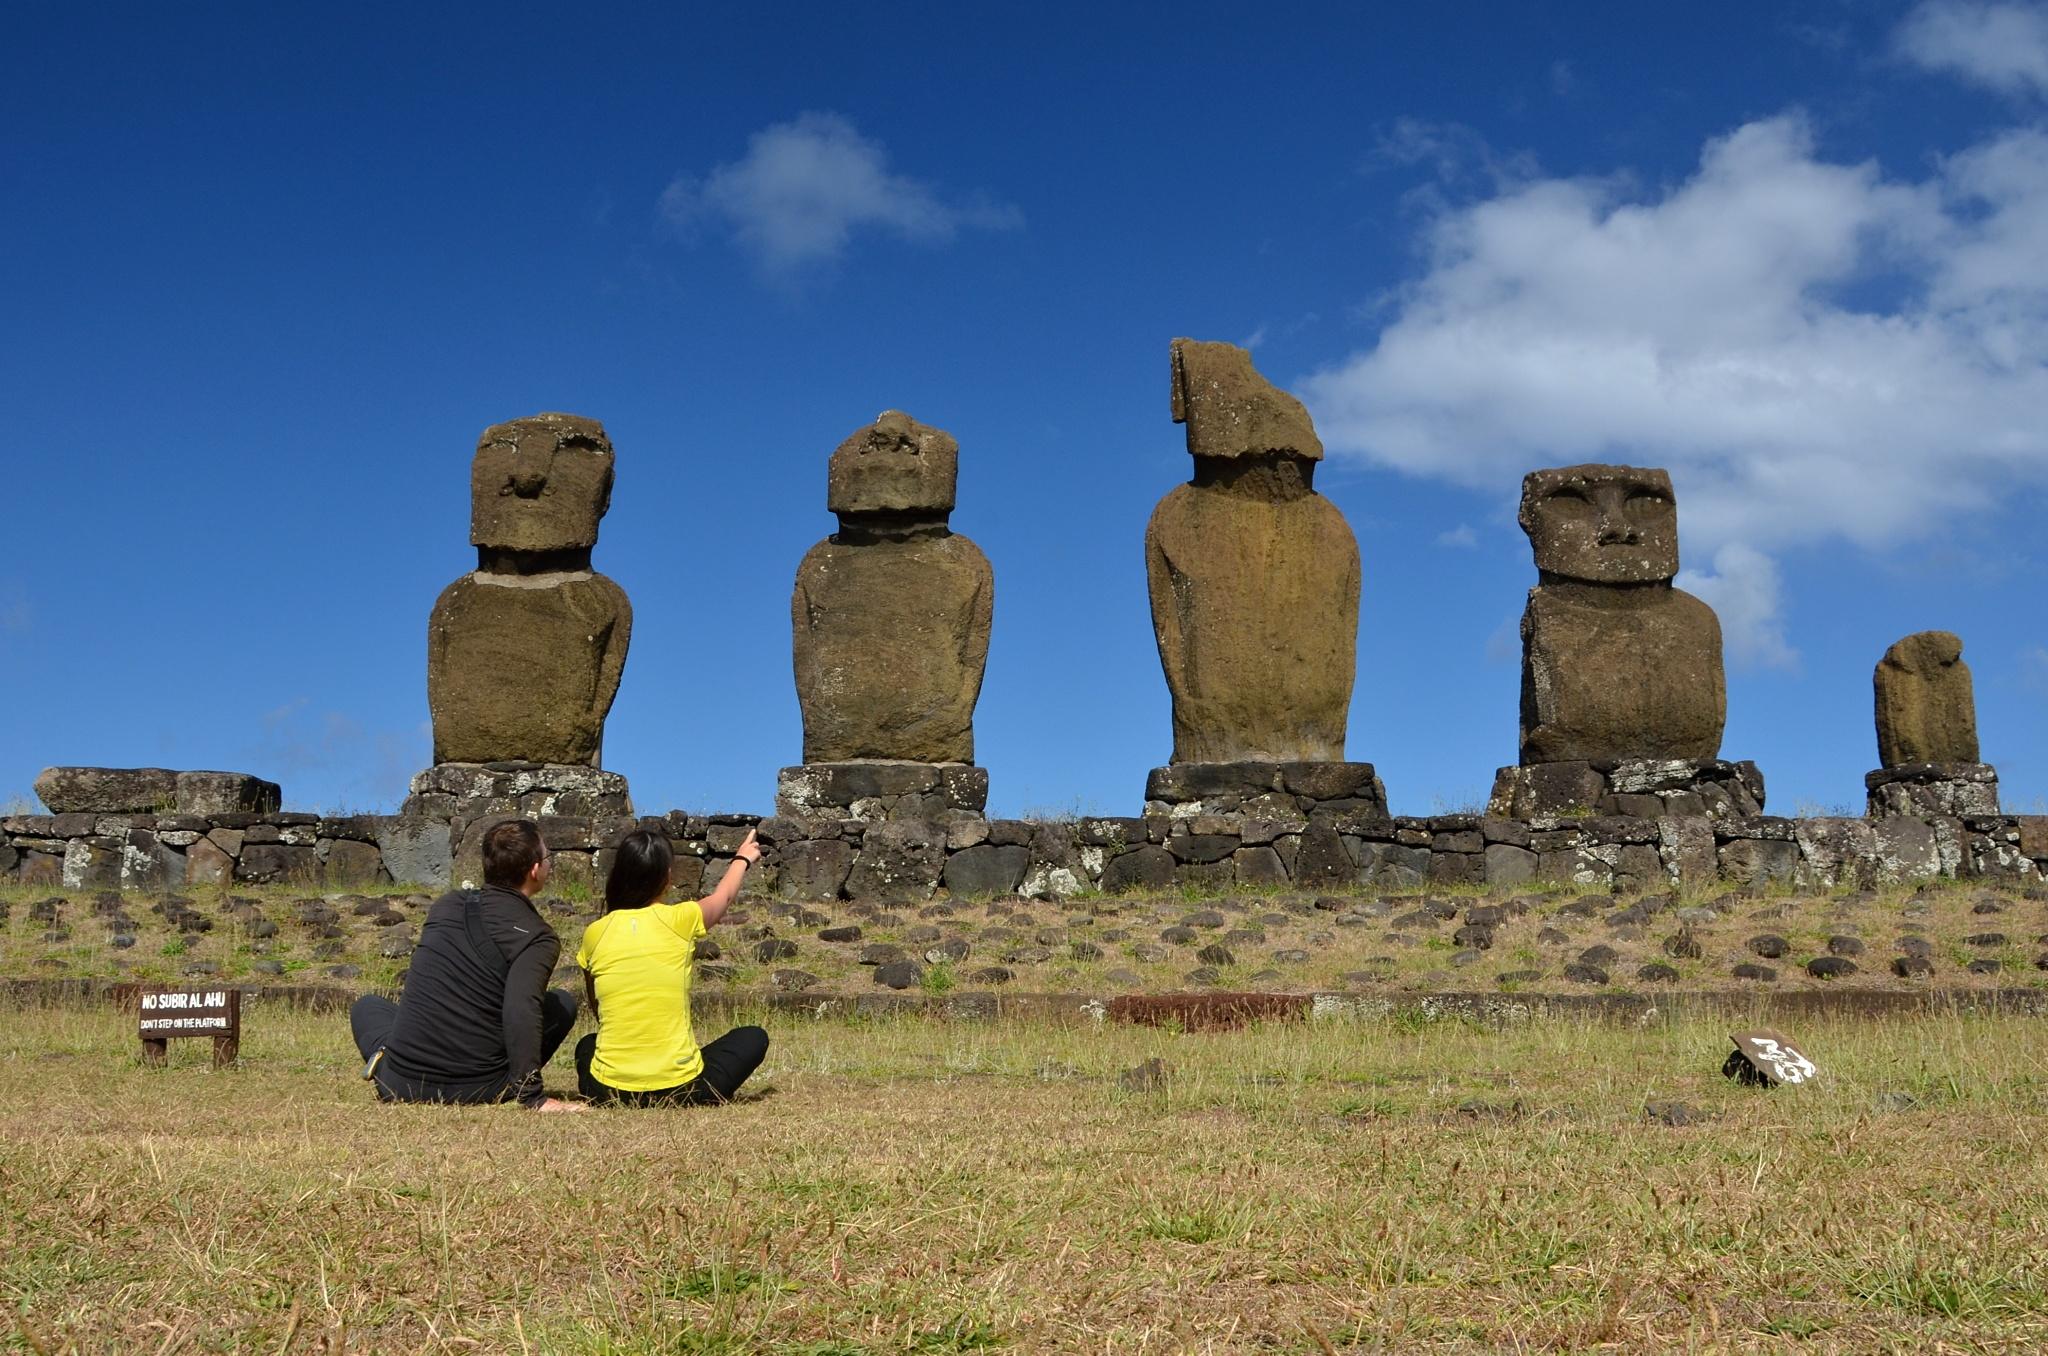 Nadšení diváci u Moai na Ahu Vai Uri